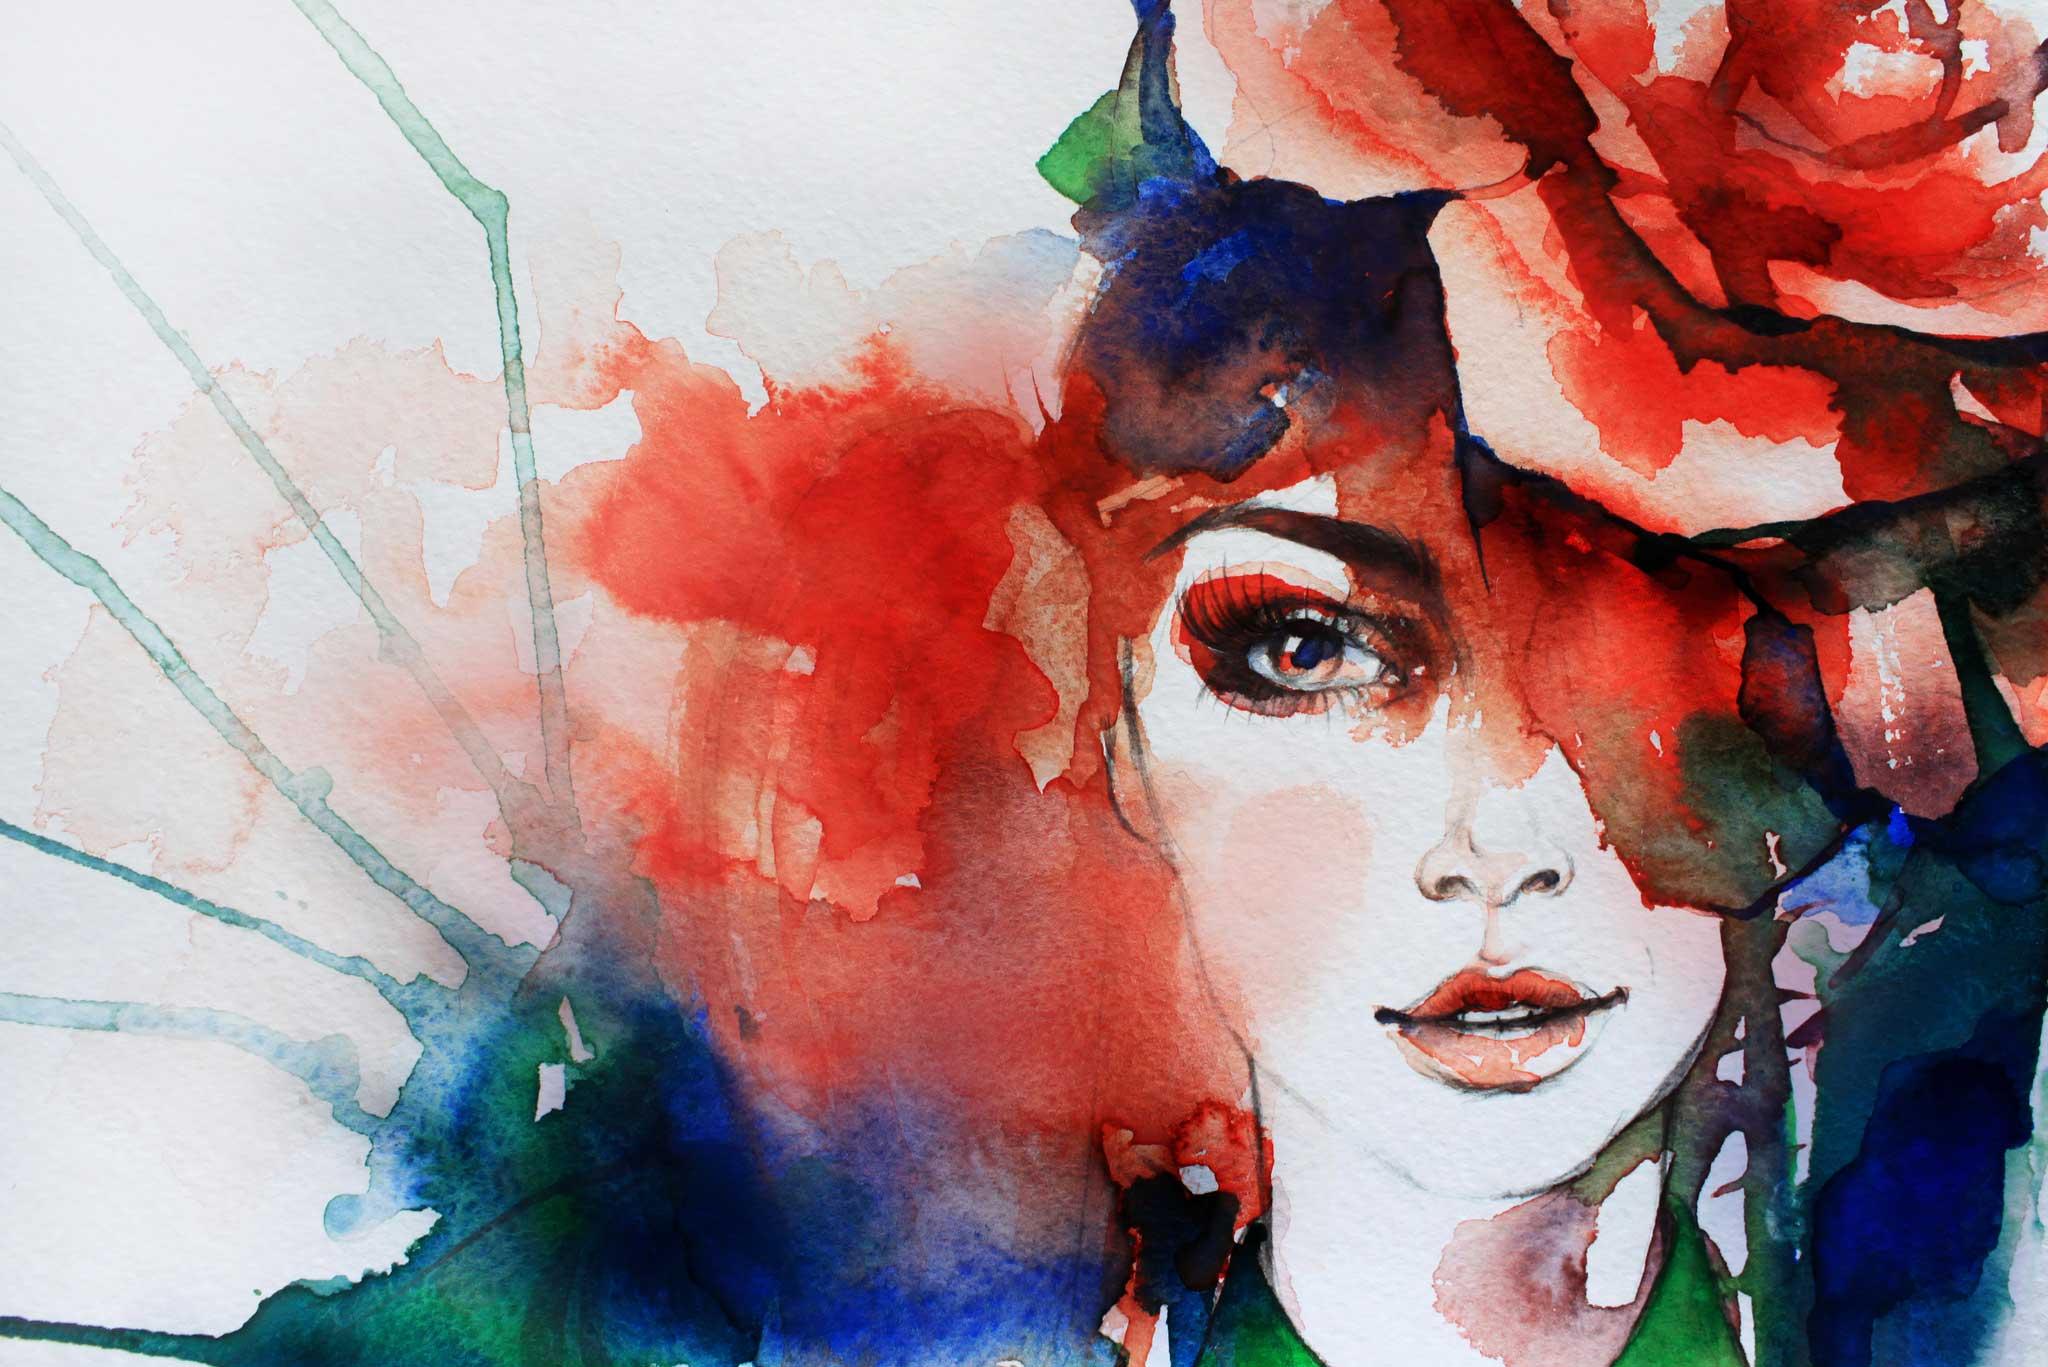 tapet-fototapet-design-decor-mural-customizabil-comanda-personalizat-bucuresti-daring-prints-motiv-model-desen-acuarela-portret-femeie-fata